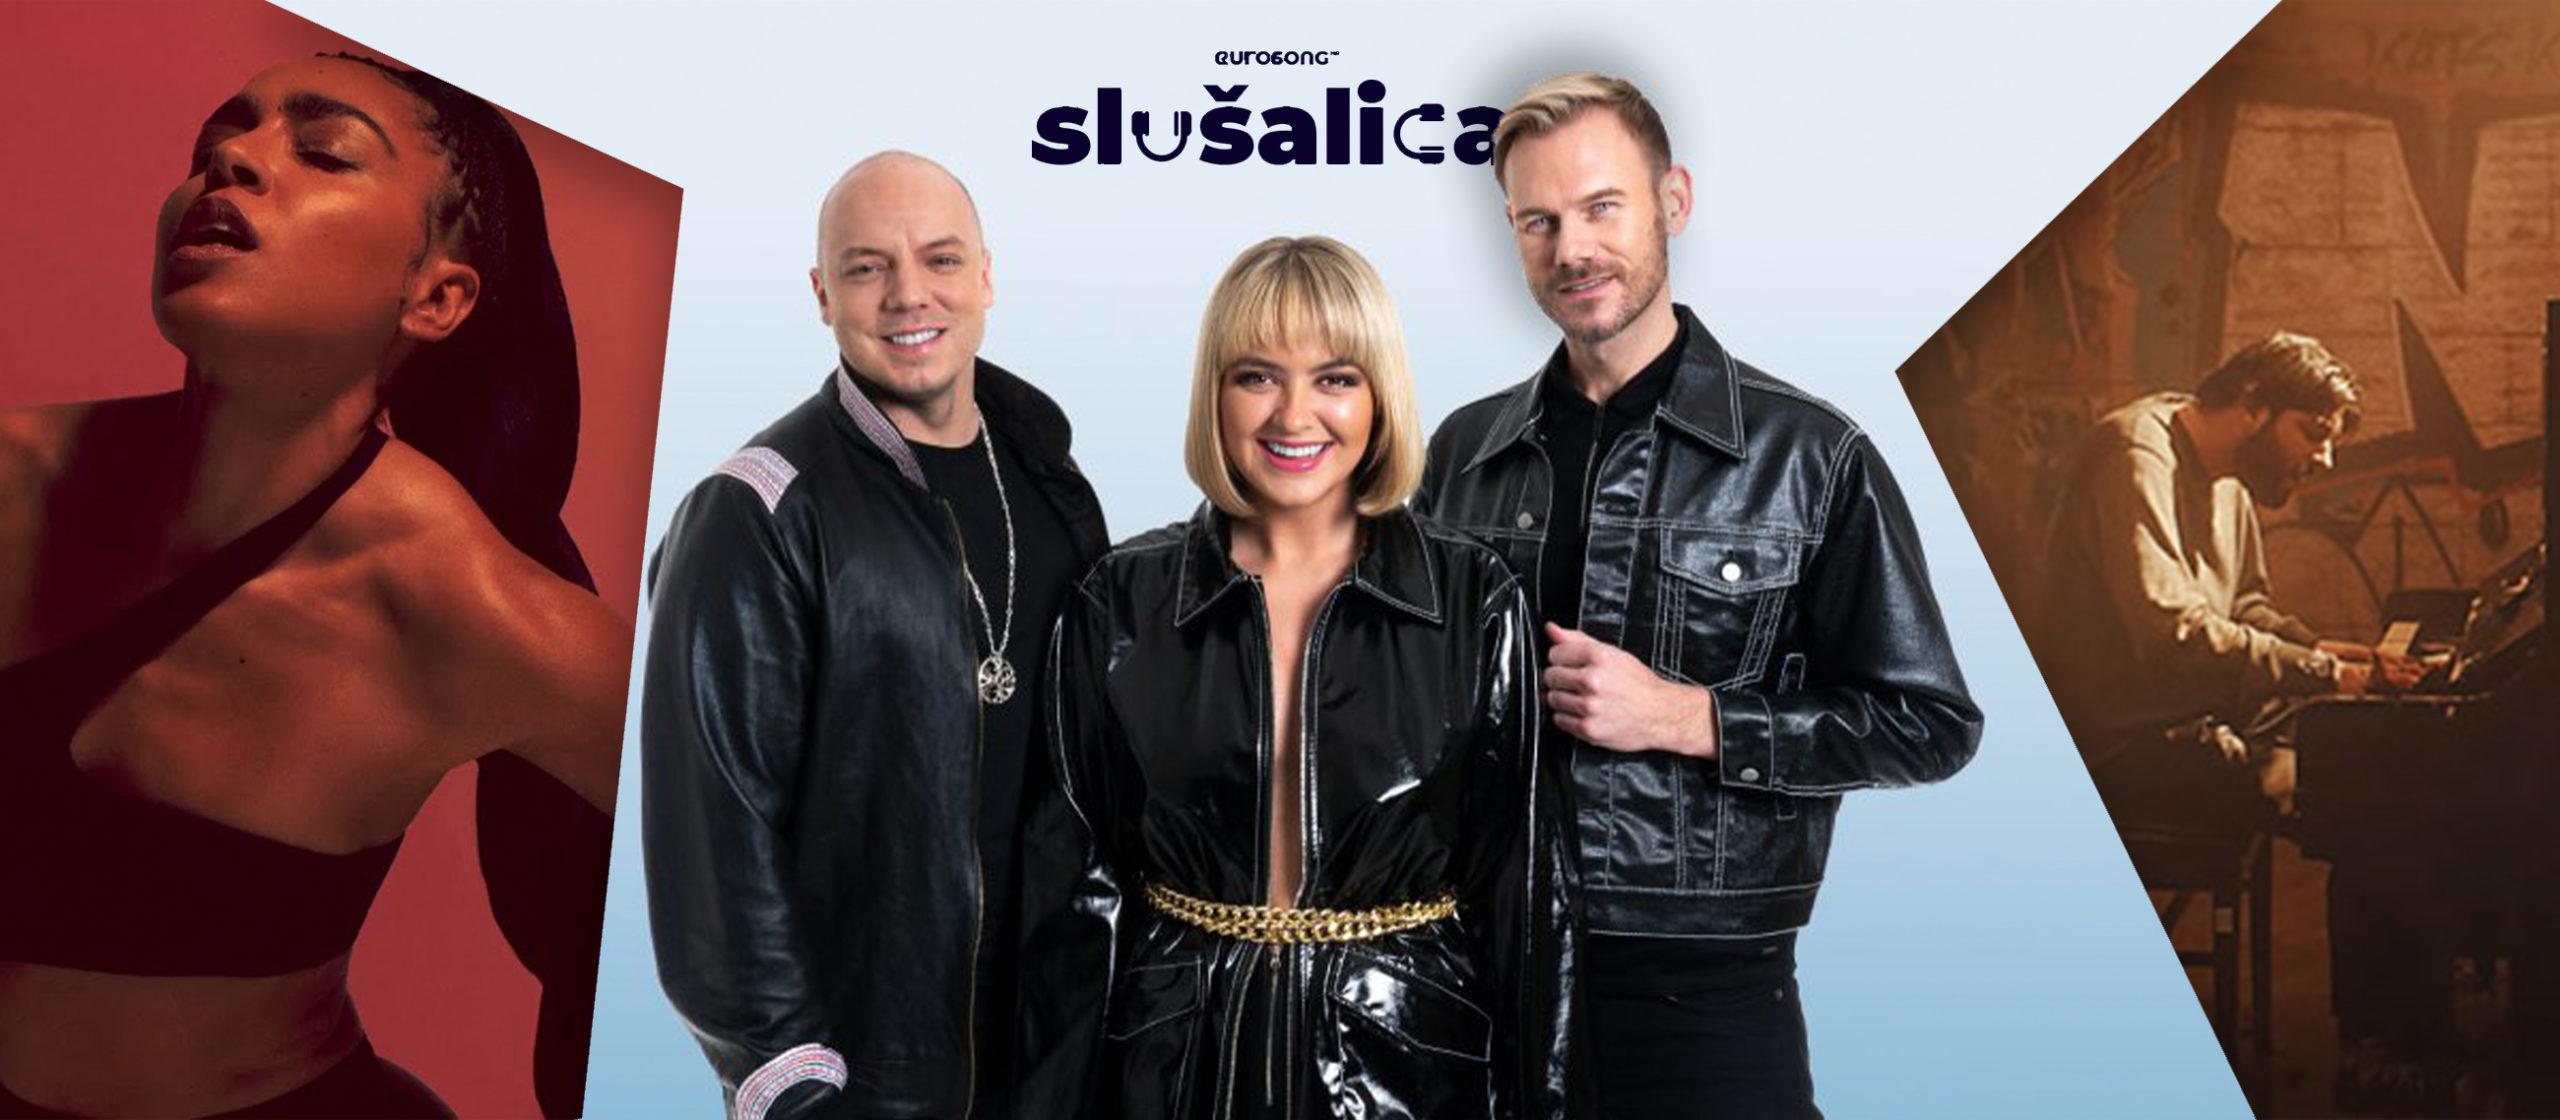 Eurosong Slušalica vizual za strani hit ožujka/marta 2021